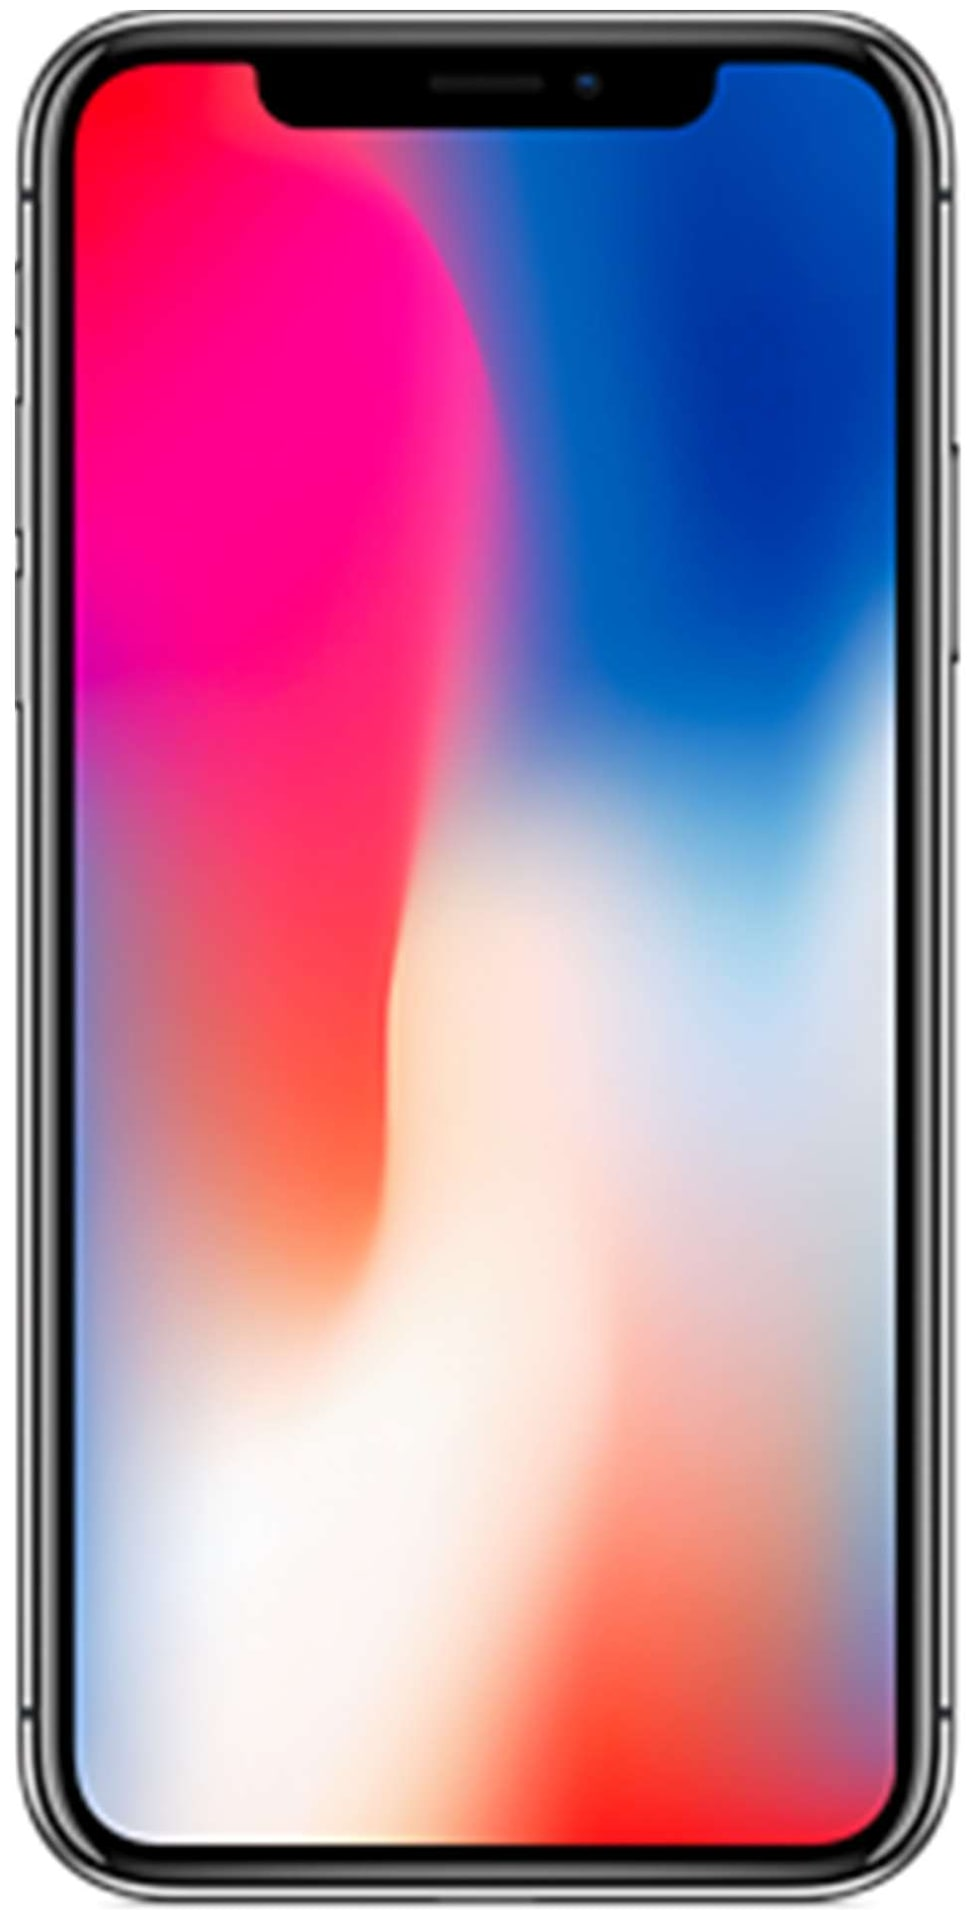 Apple iphone X 256 gb, space grey